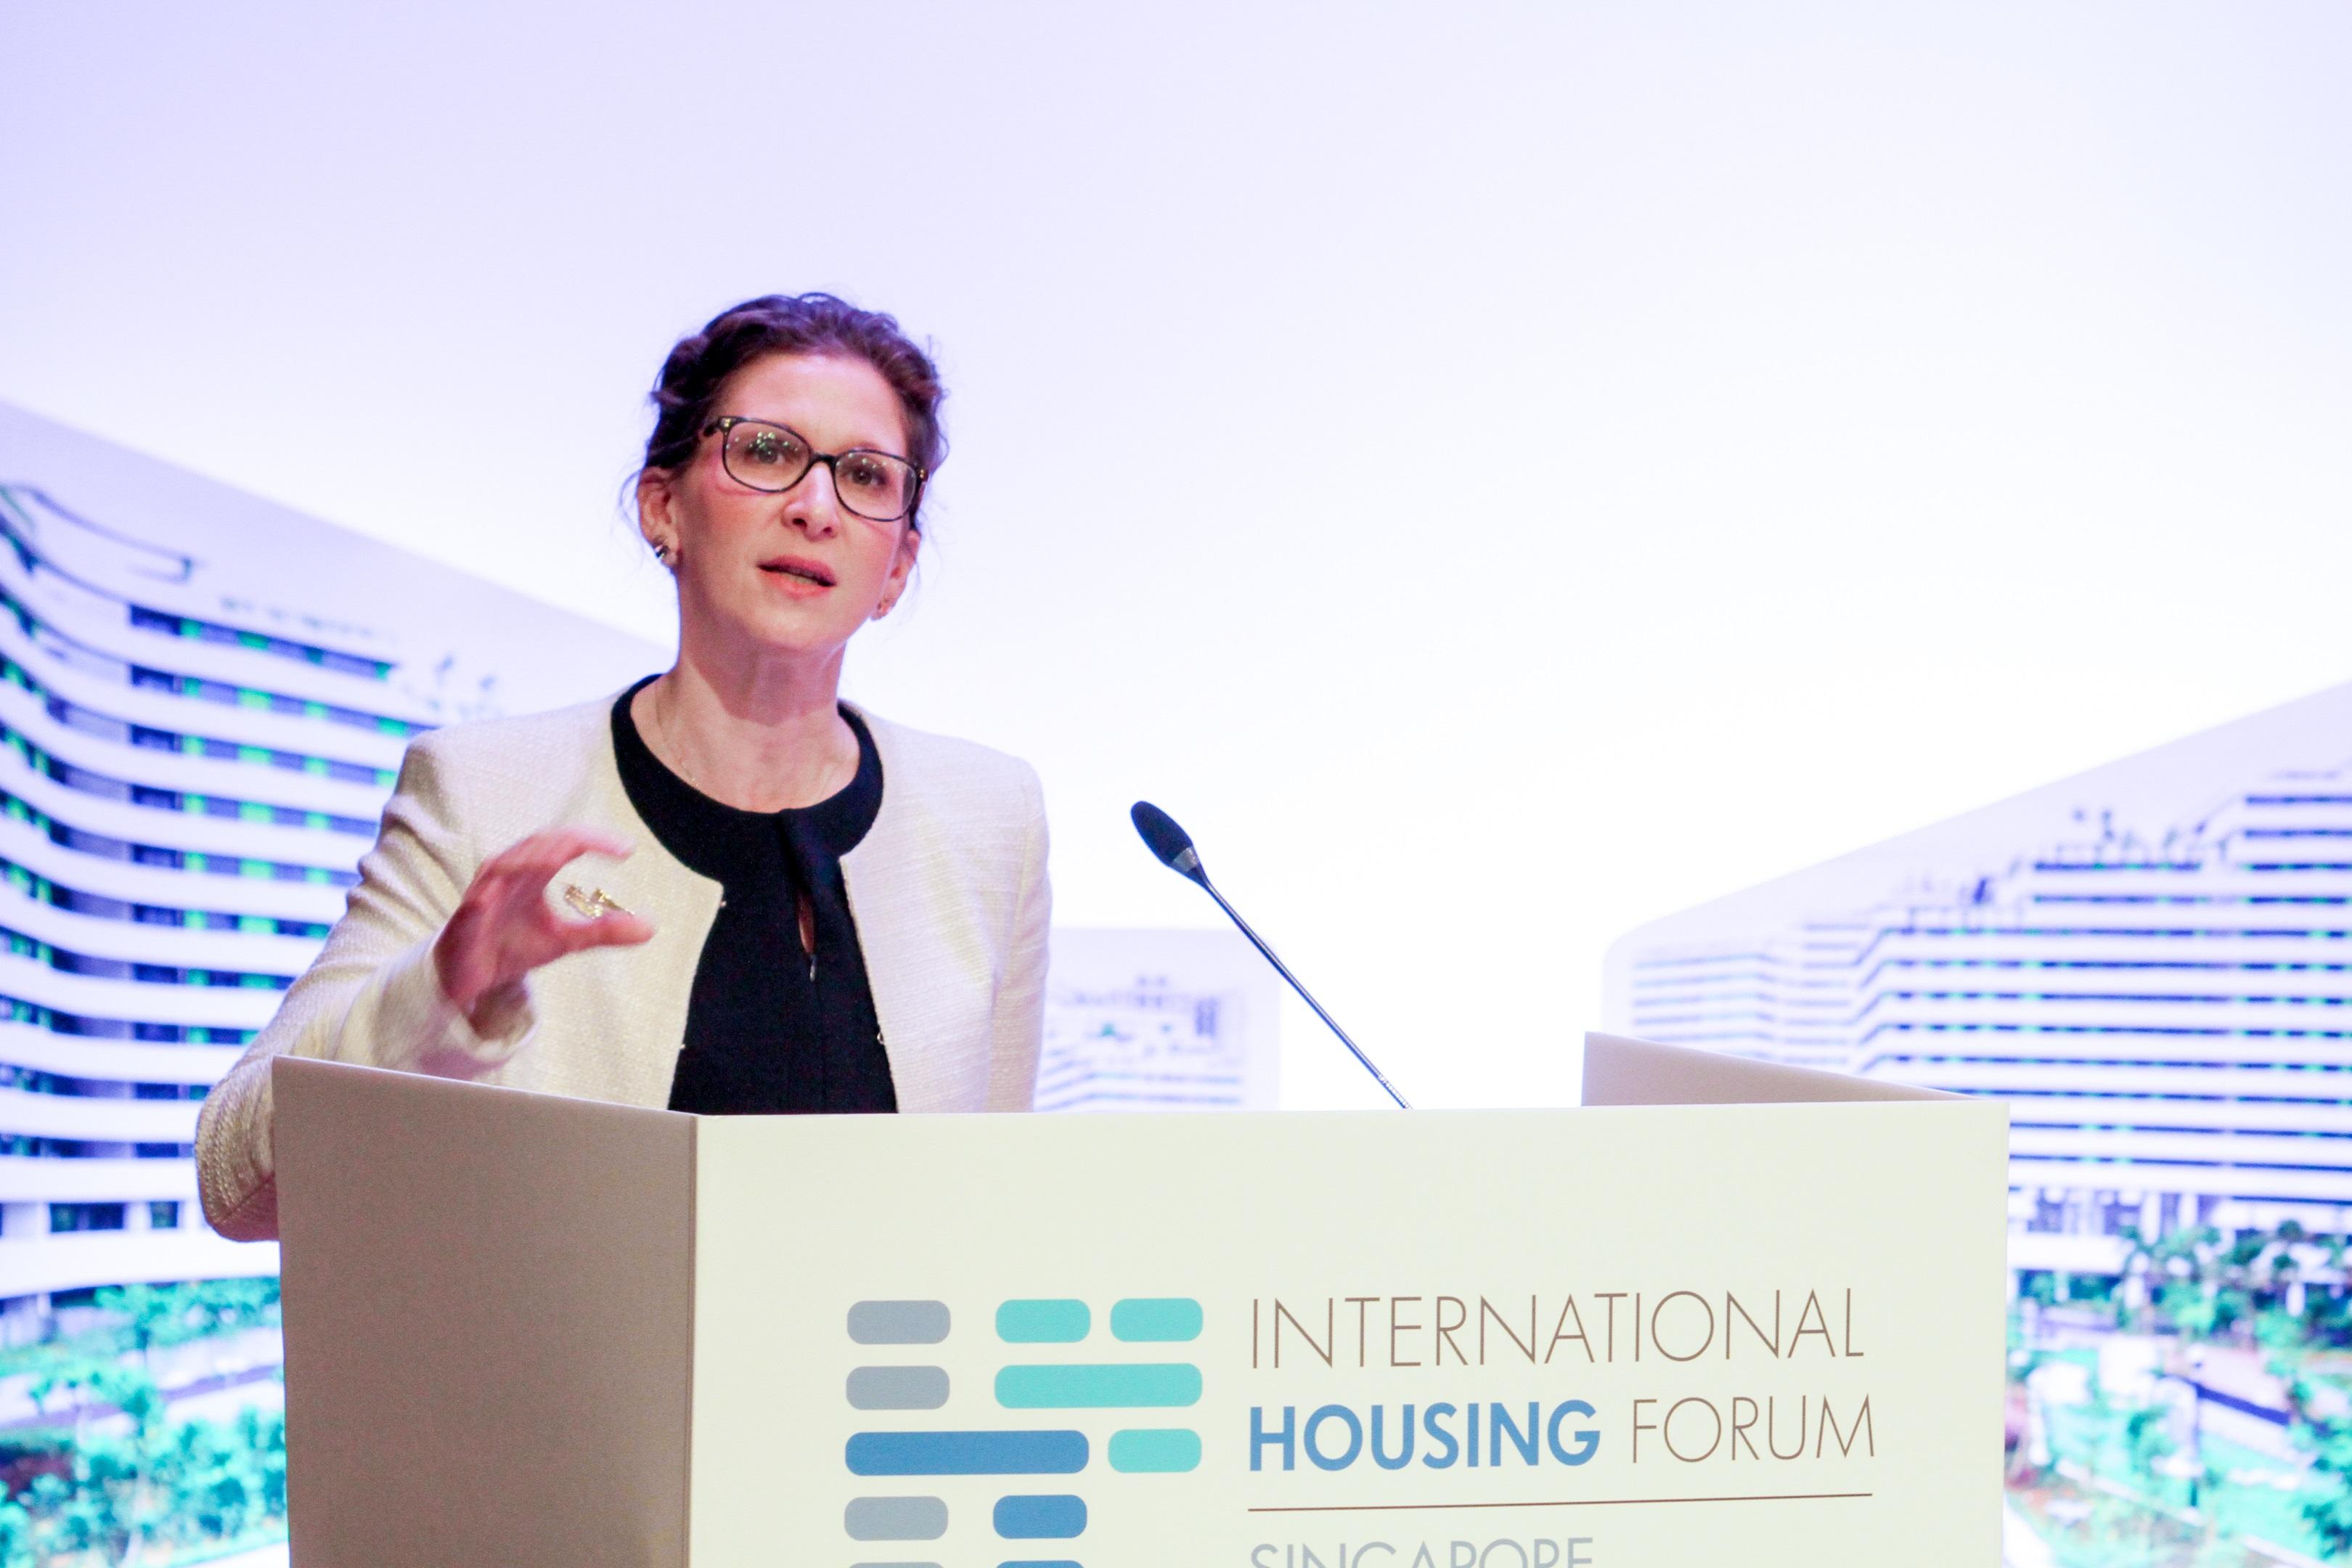 International Housing Forum